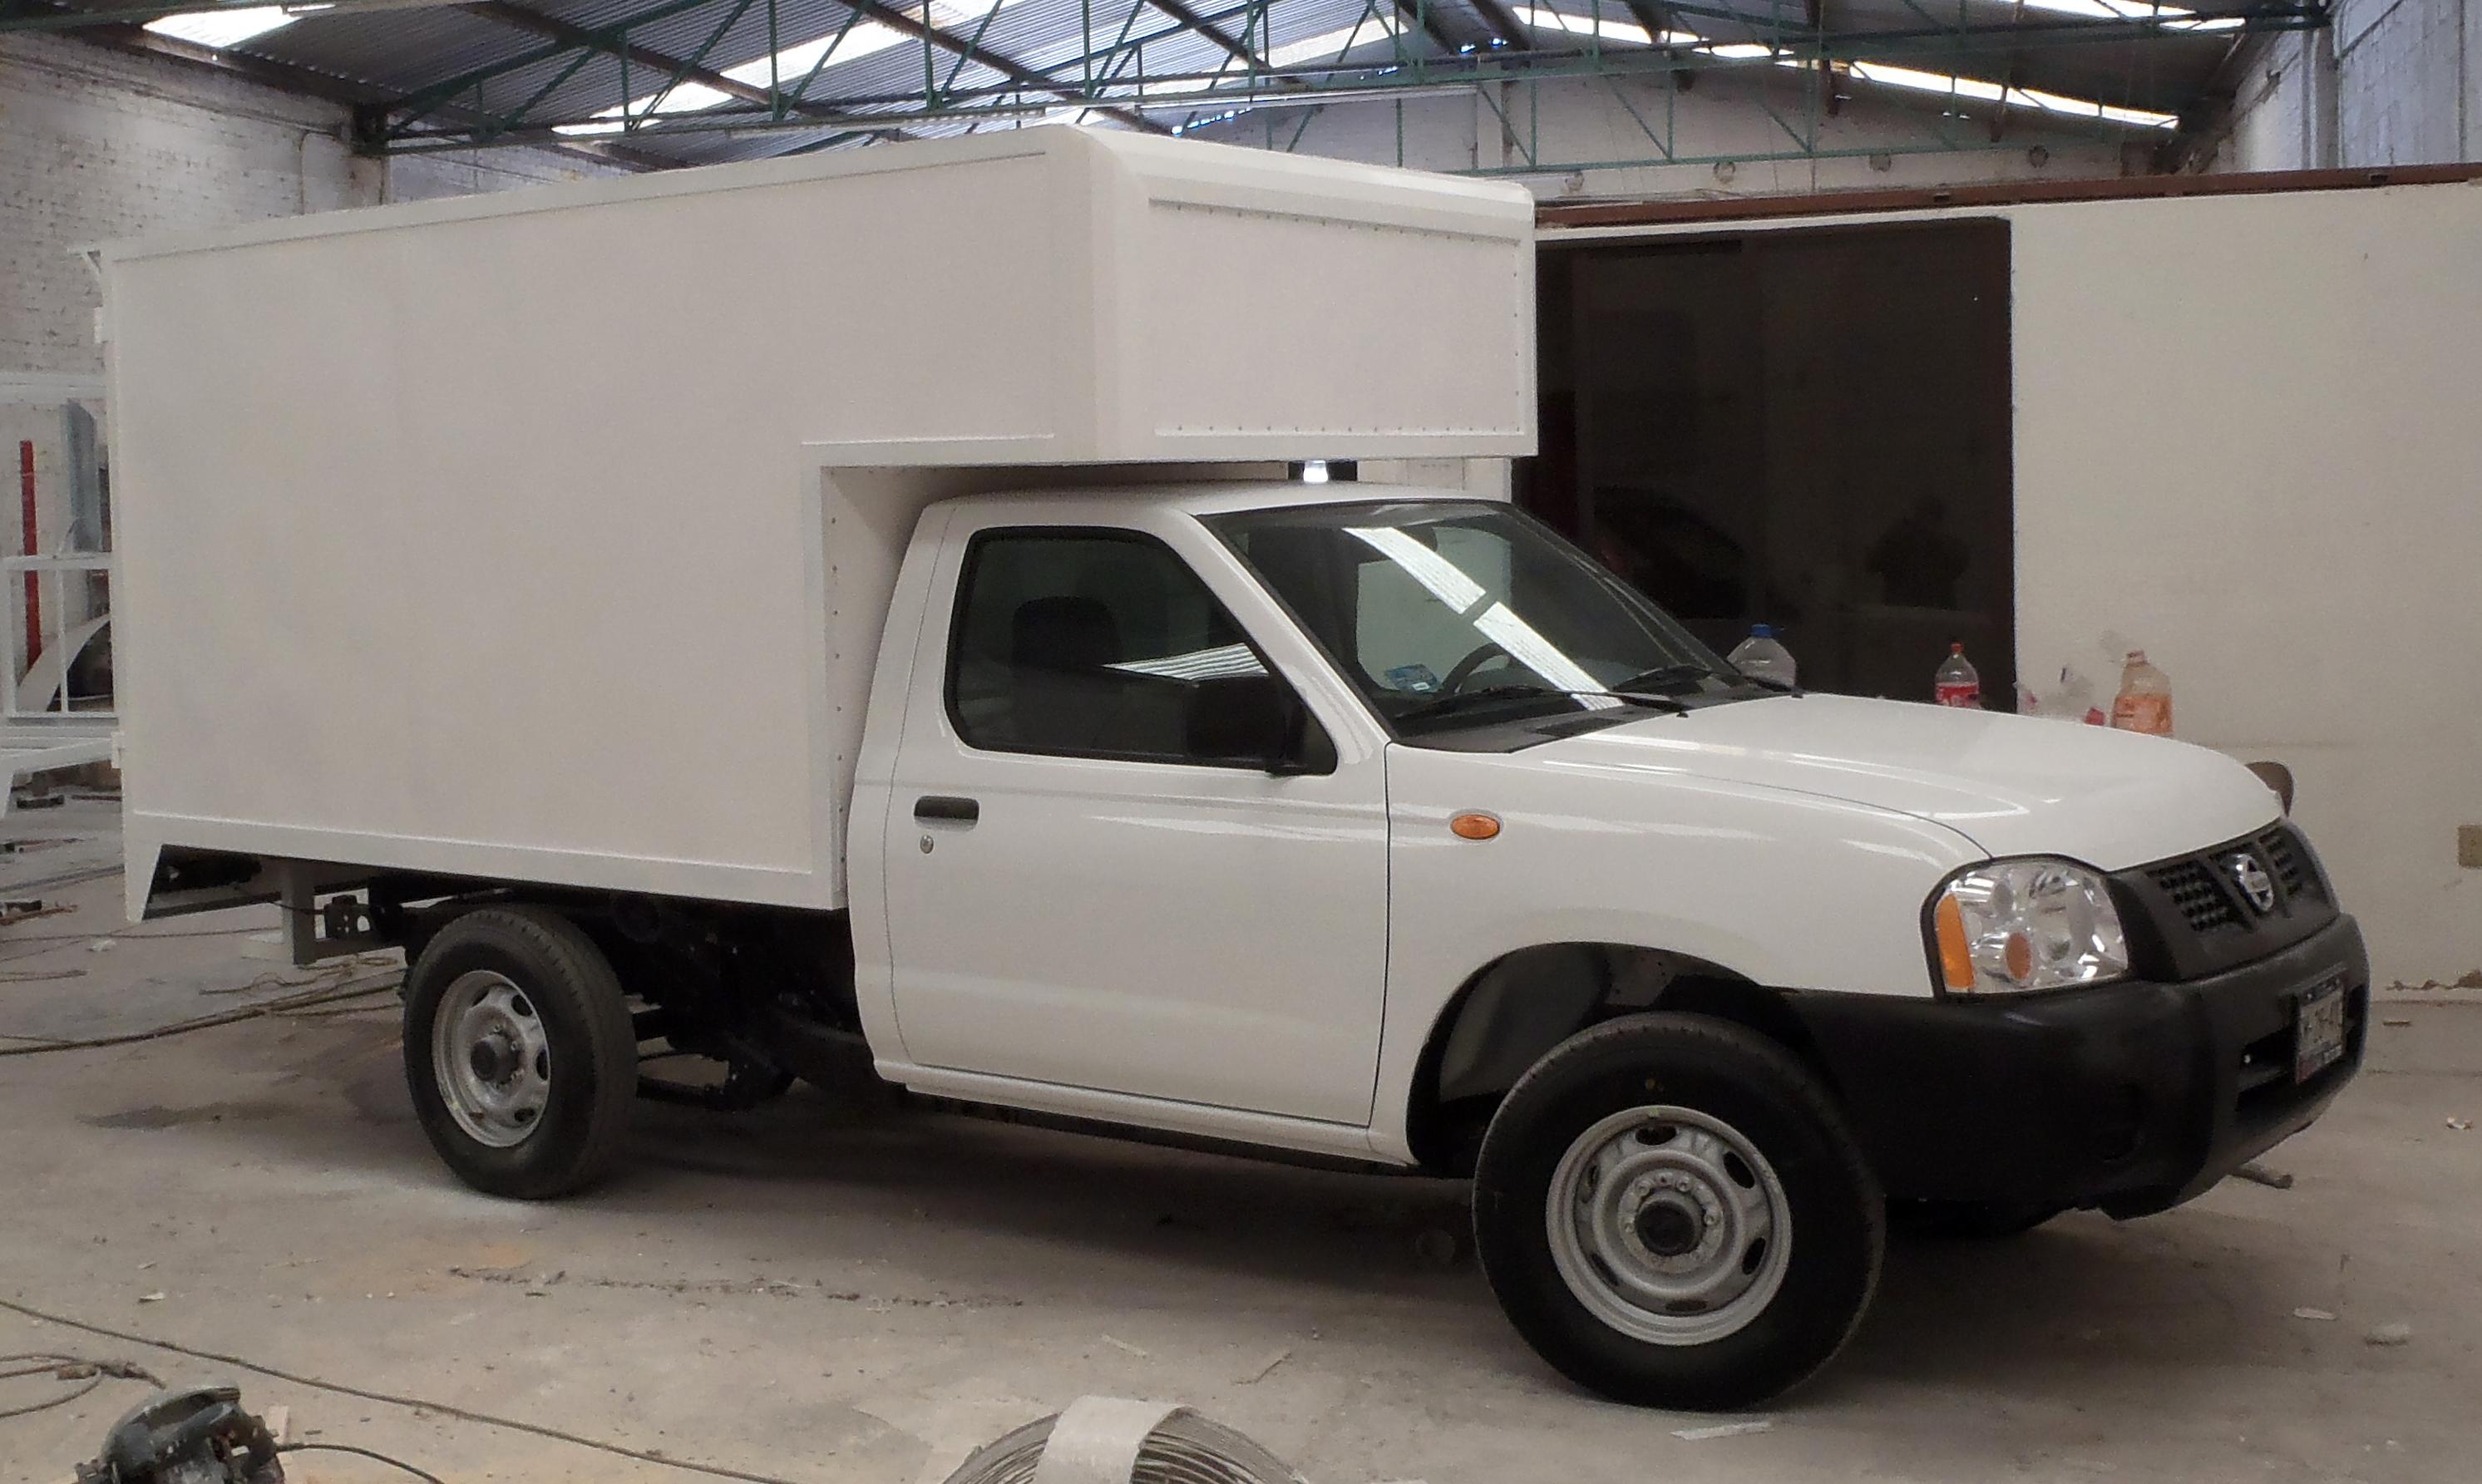 Nissan Autocom Pick Ups Usadas En Venta En Jalisco.html | Autos Weblog